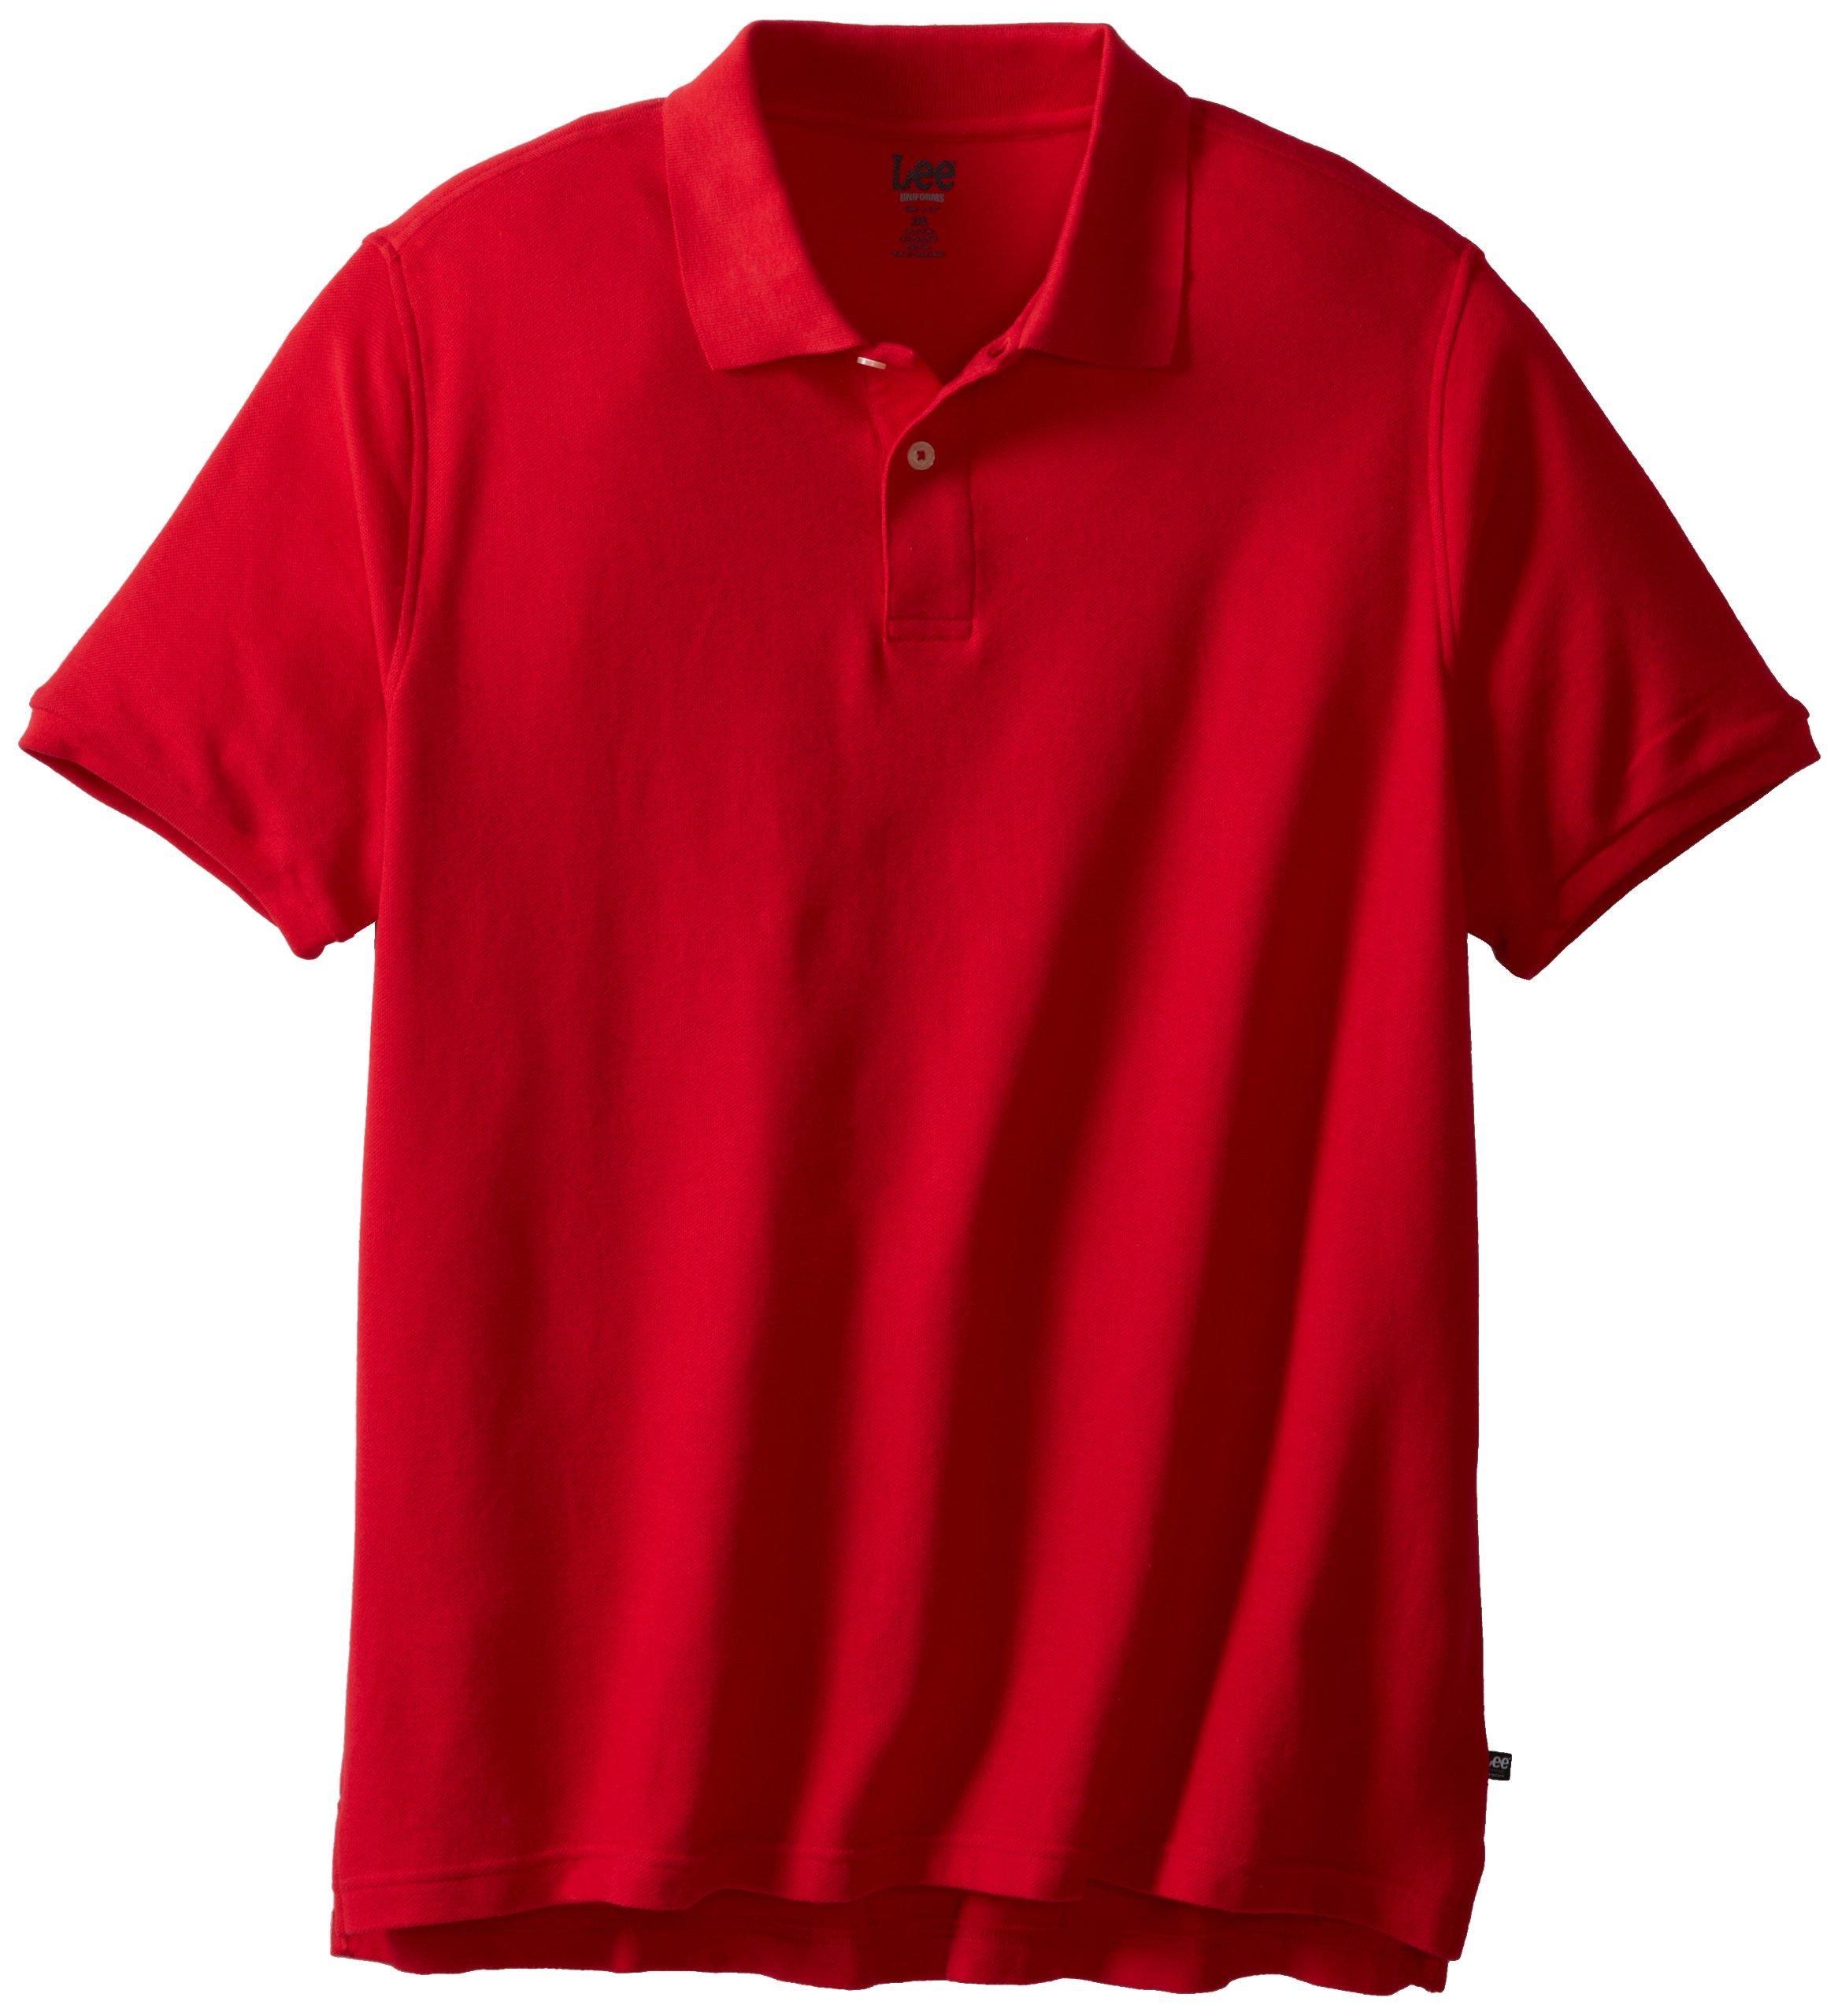 Lee Uniforms Modern Fit Short Sleeve Polo Shirt,Red,3XL